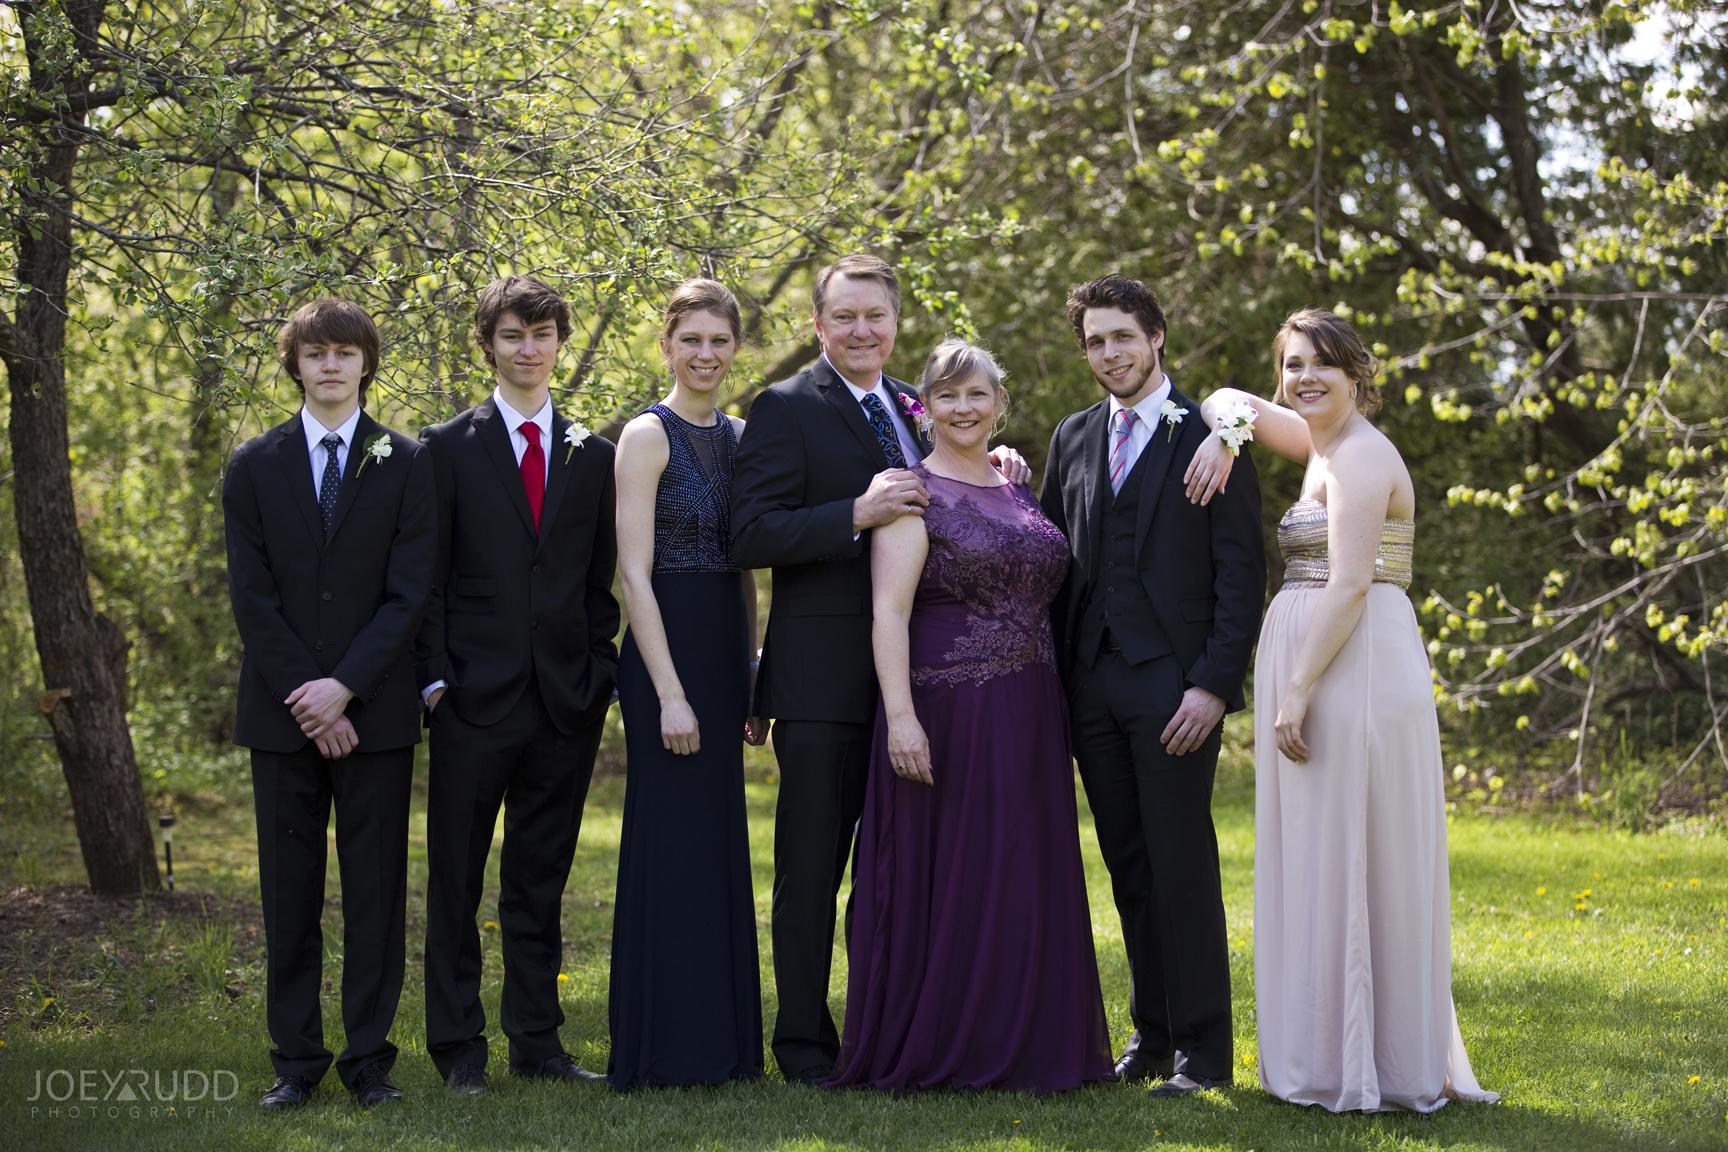 Elopement Session at Jabulani Vineyard by Joey Rudd Photography Ottawa Wedding Photographer Family Shot